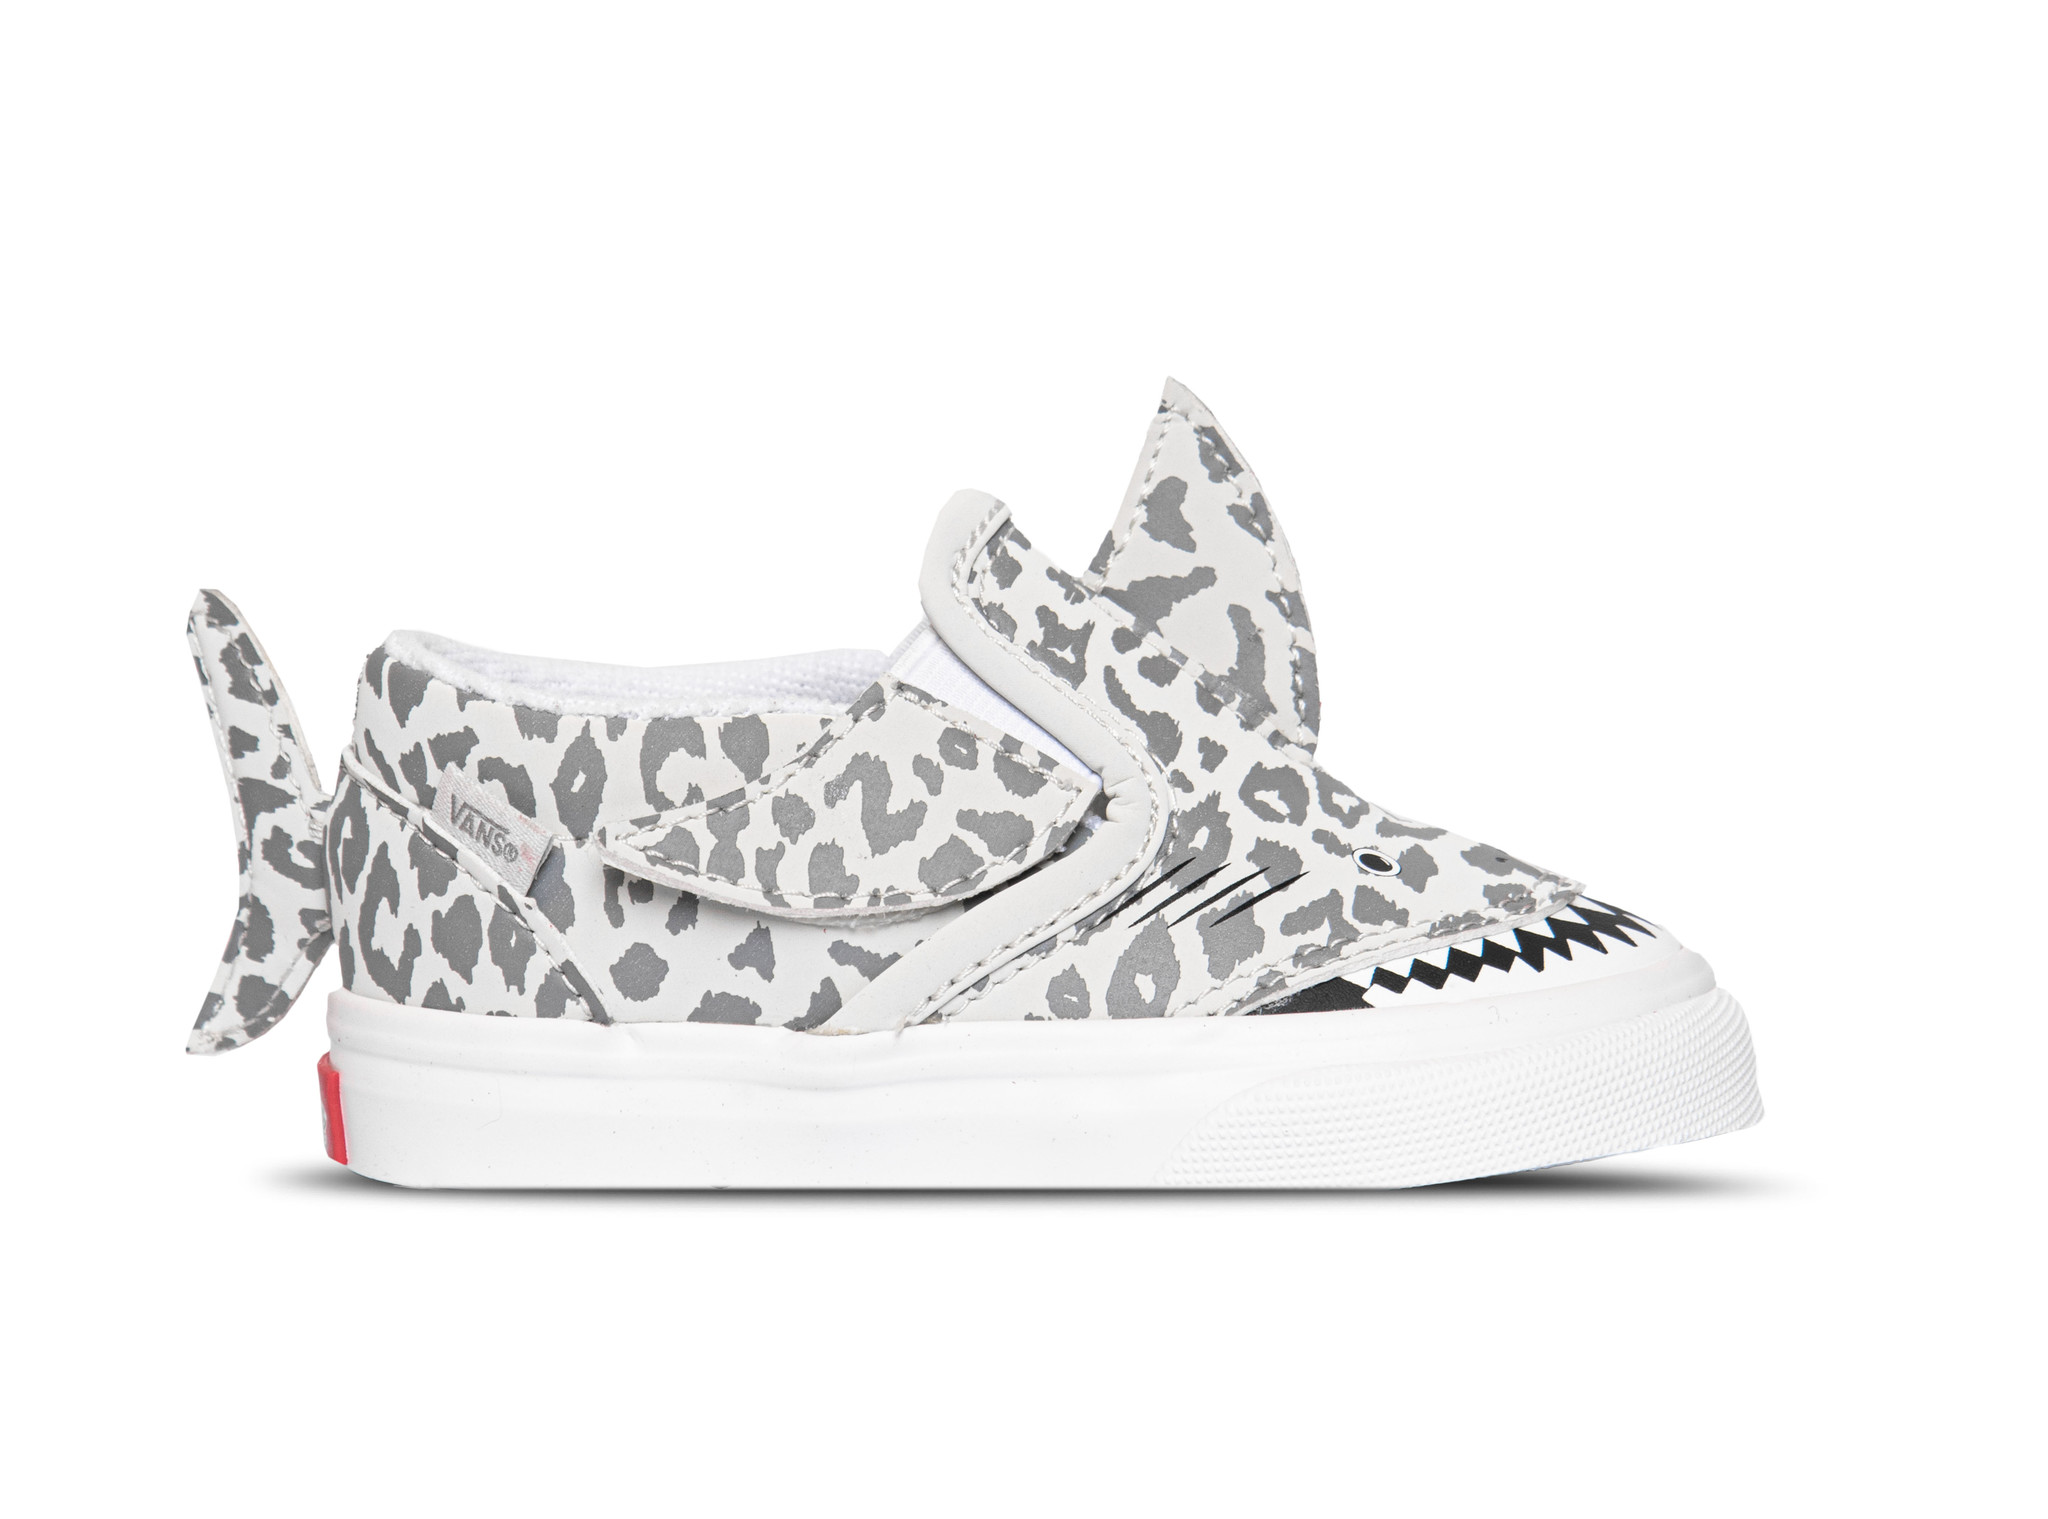 Vans Slip On V Shark Leopard Shark TD VN0A5DXG3WQ1   Bruut Online Shop